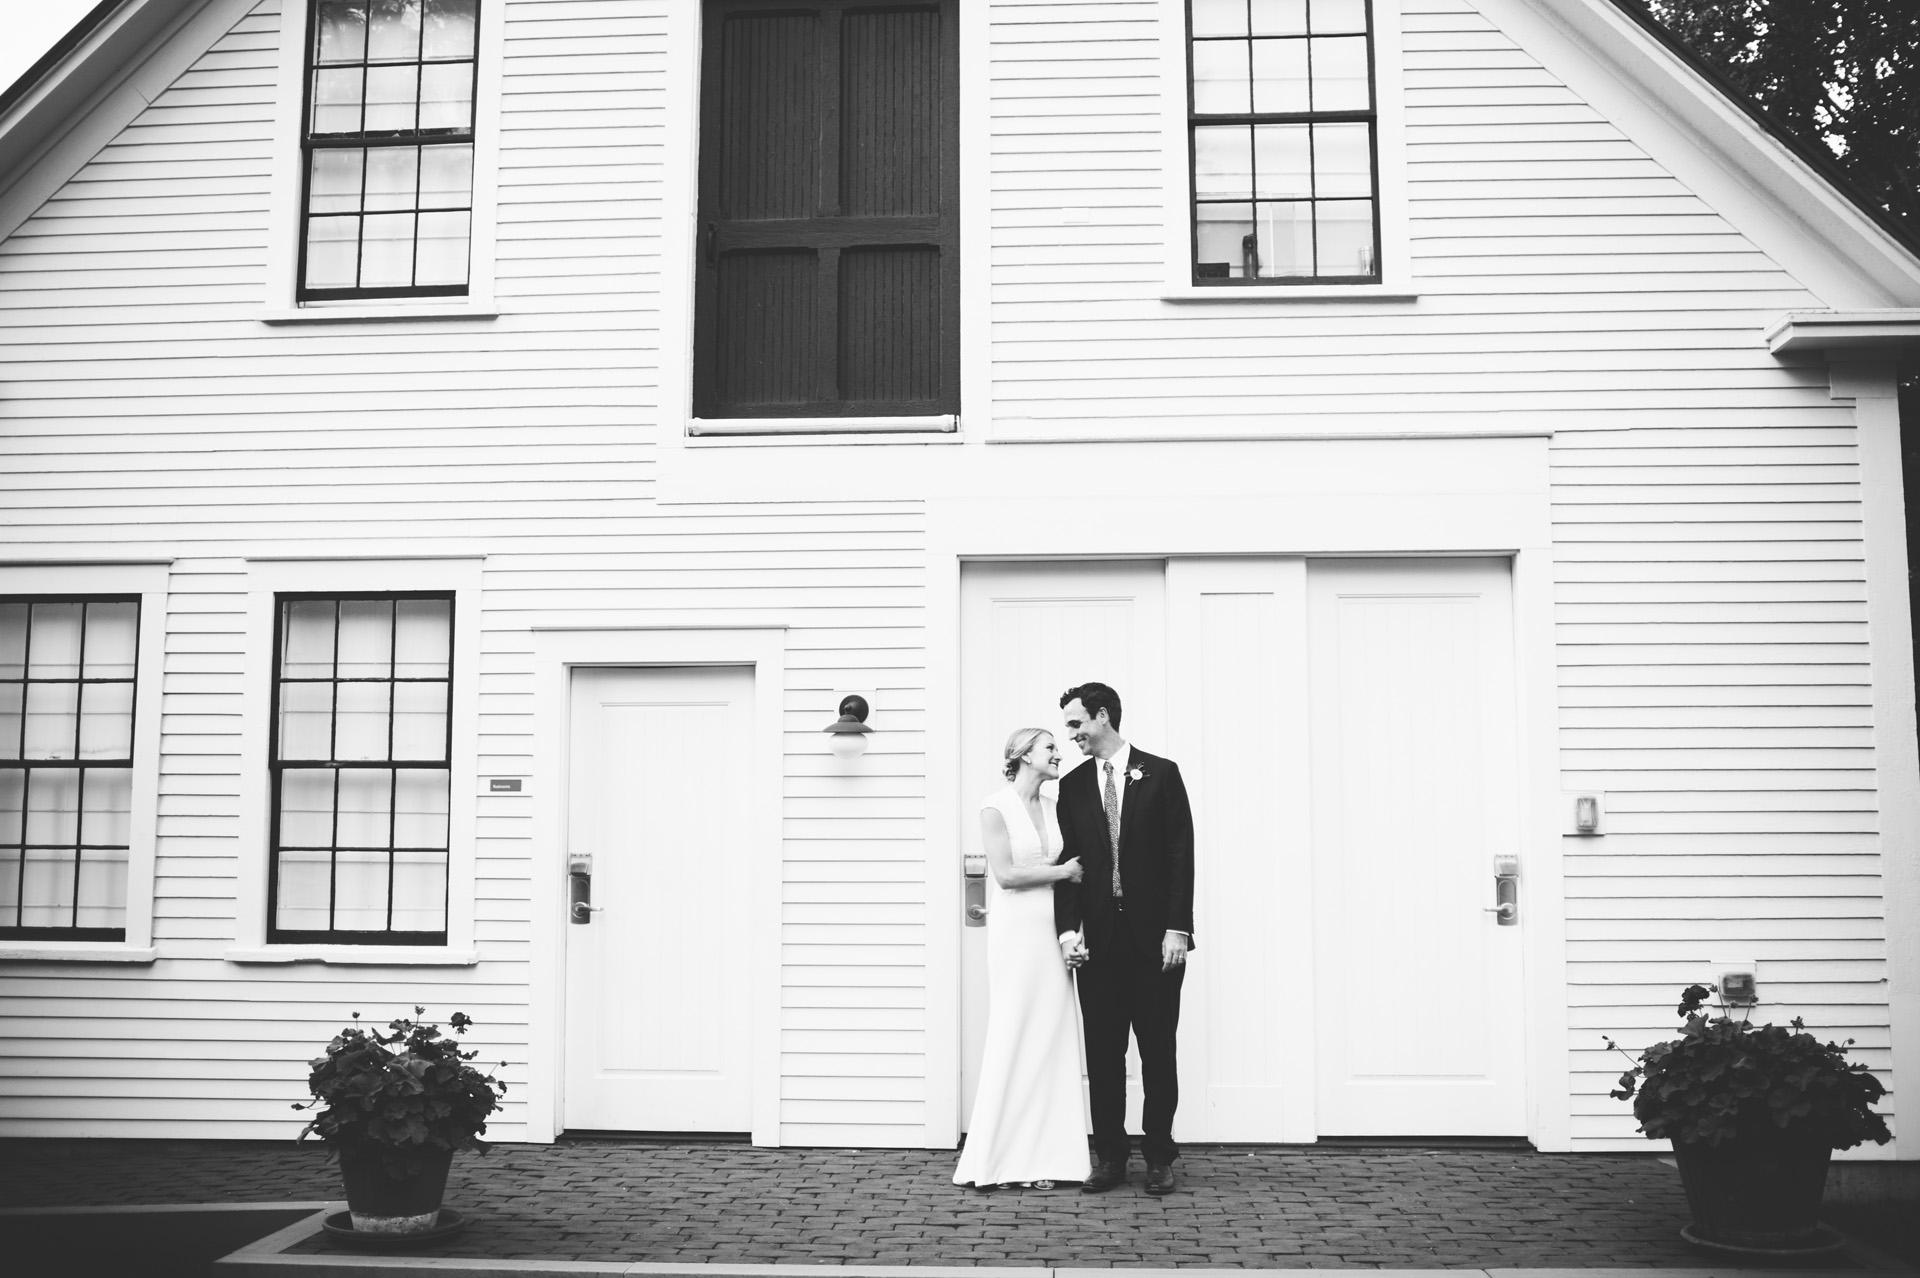 woodstock-inn-vermont-wedding-45